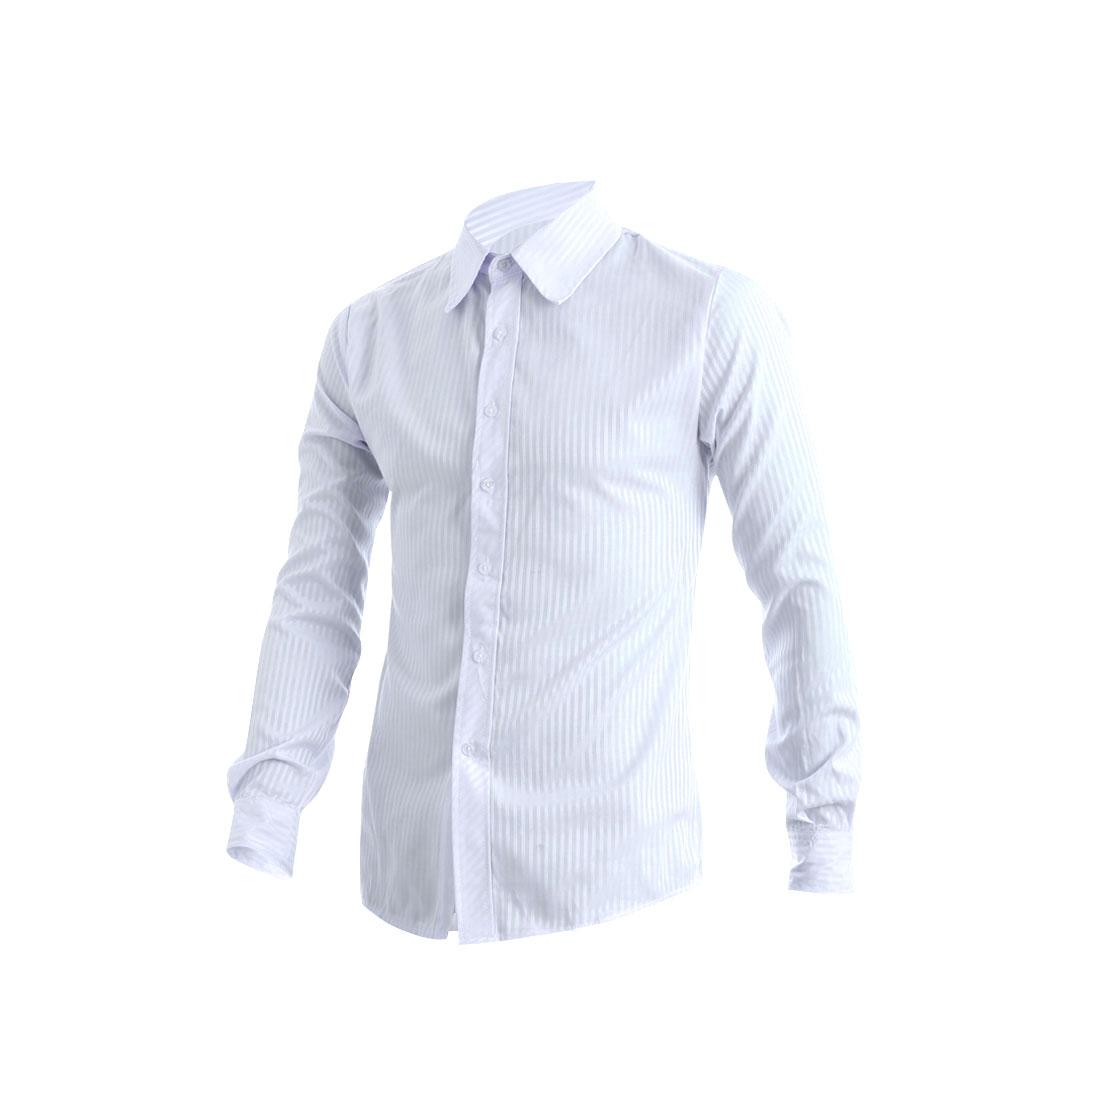 Mens Light Blue White Stripes Design Point Collar Button Down Shirt M